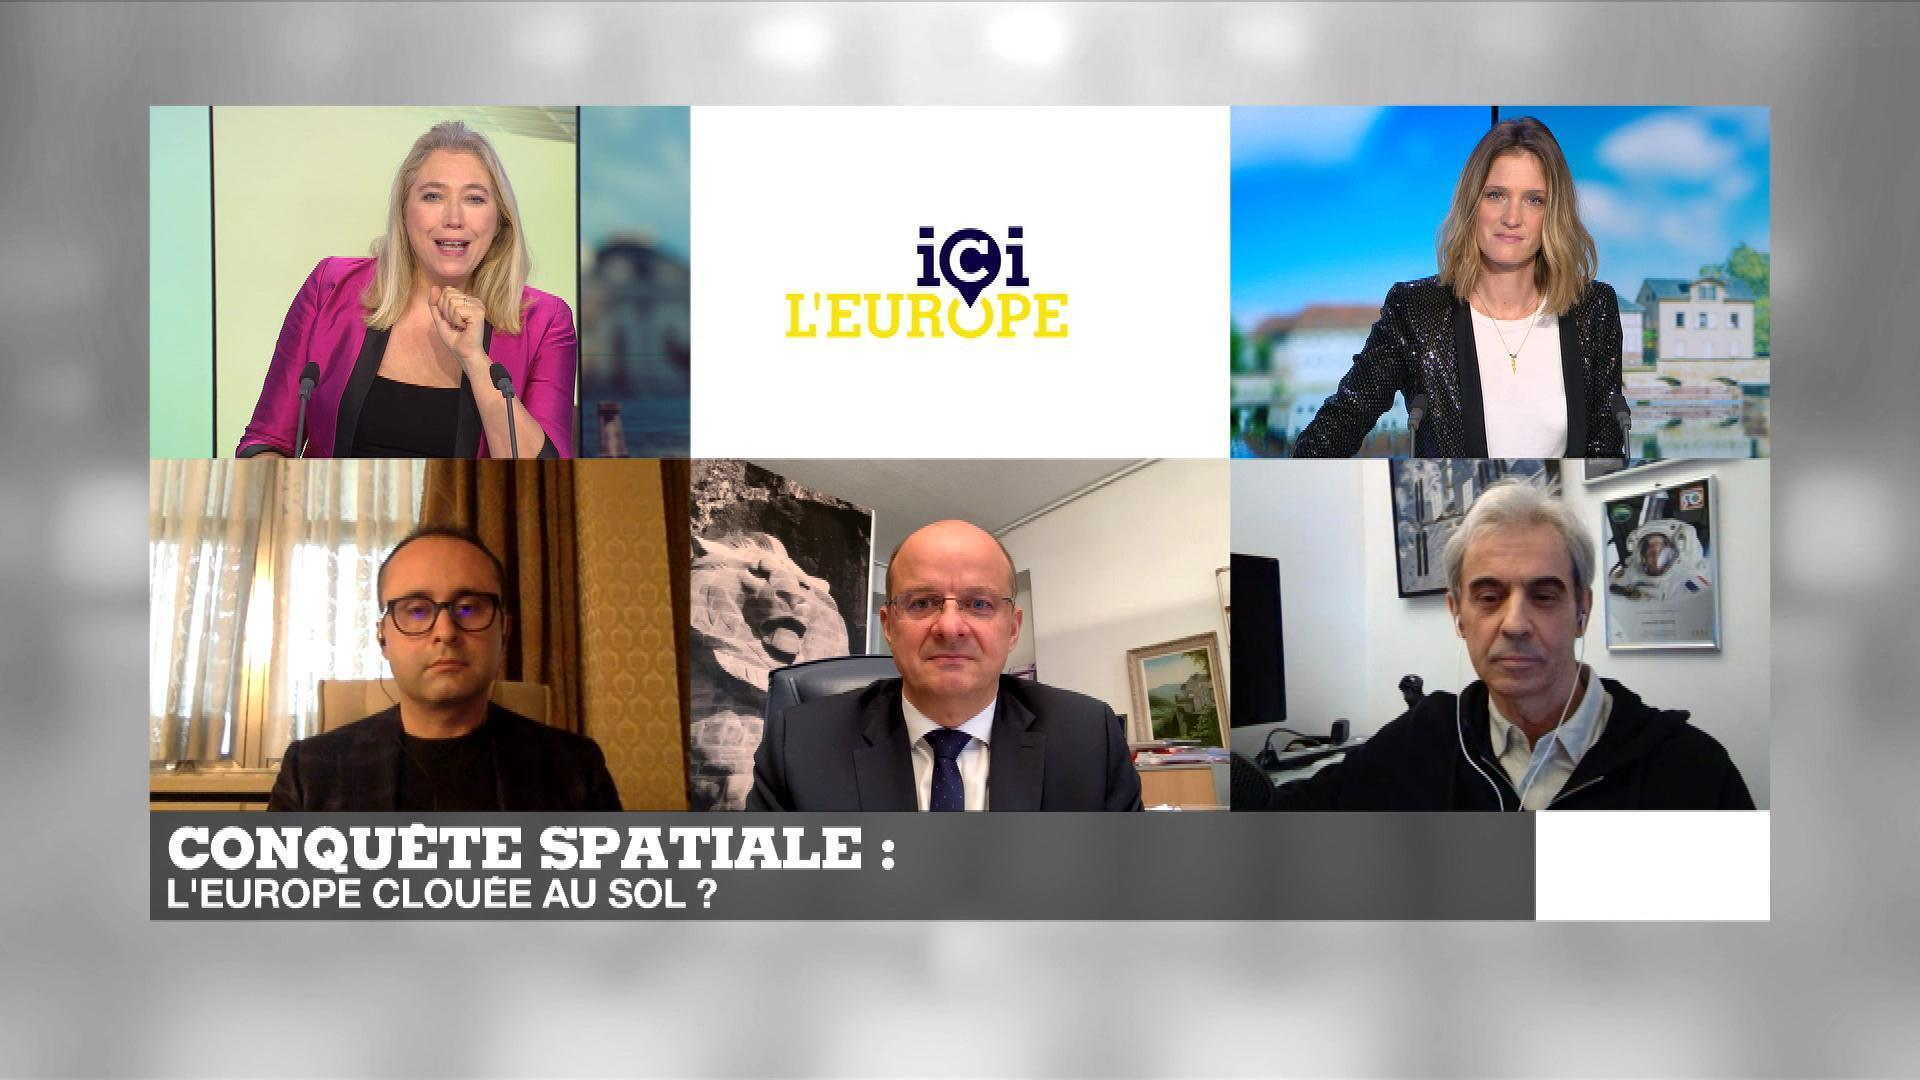 ICI_EUROPE_DEBAT_ESPACE